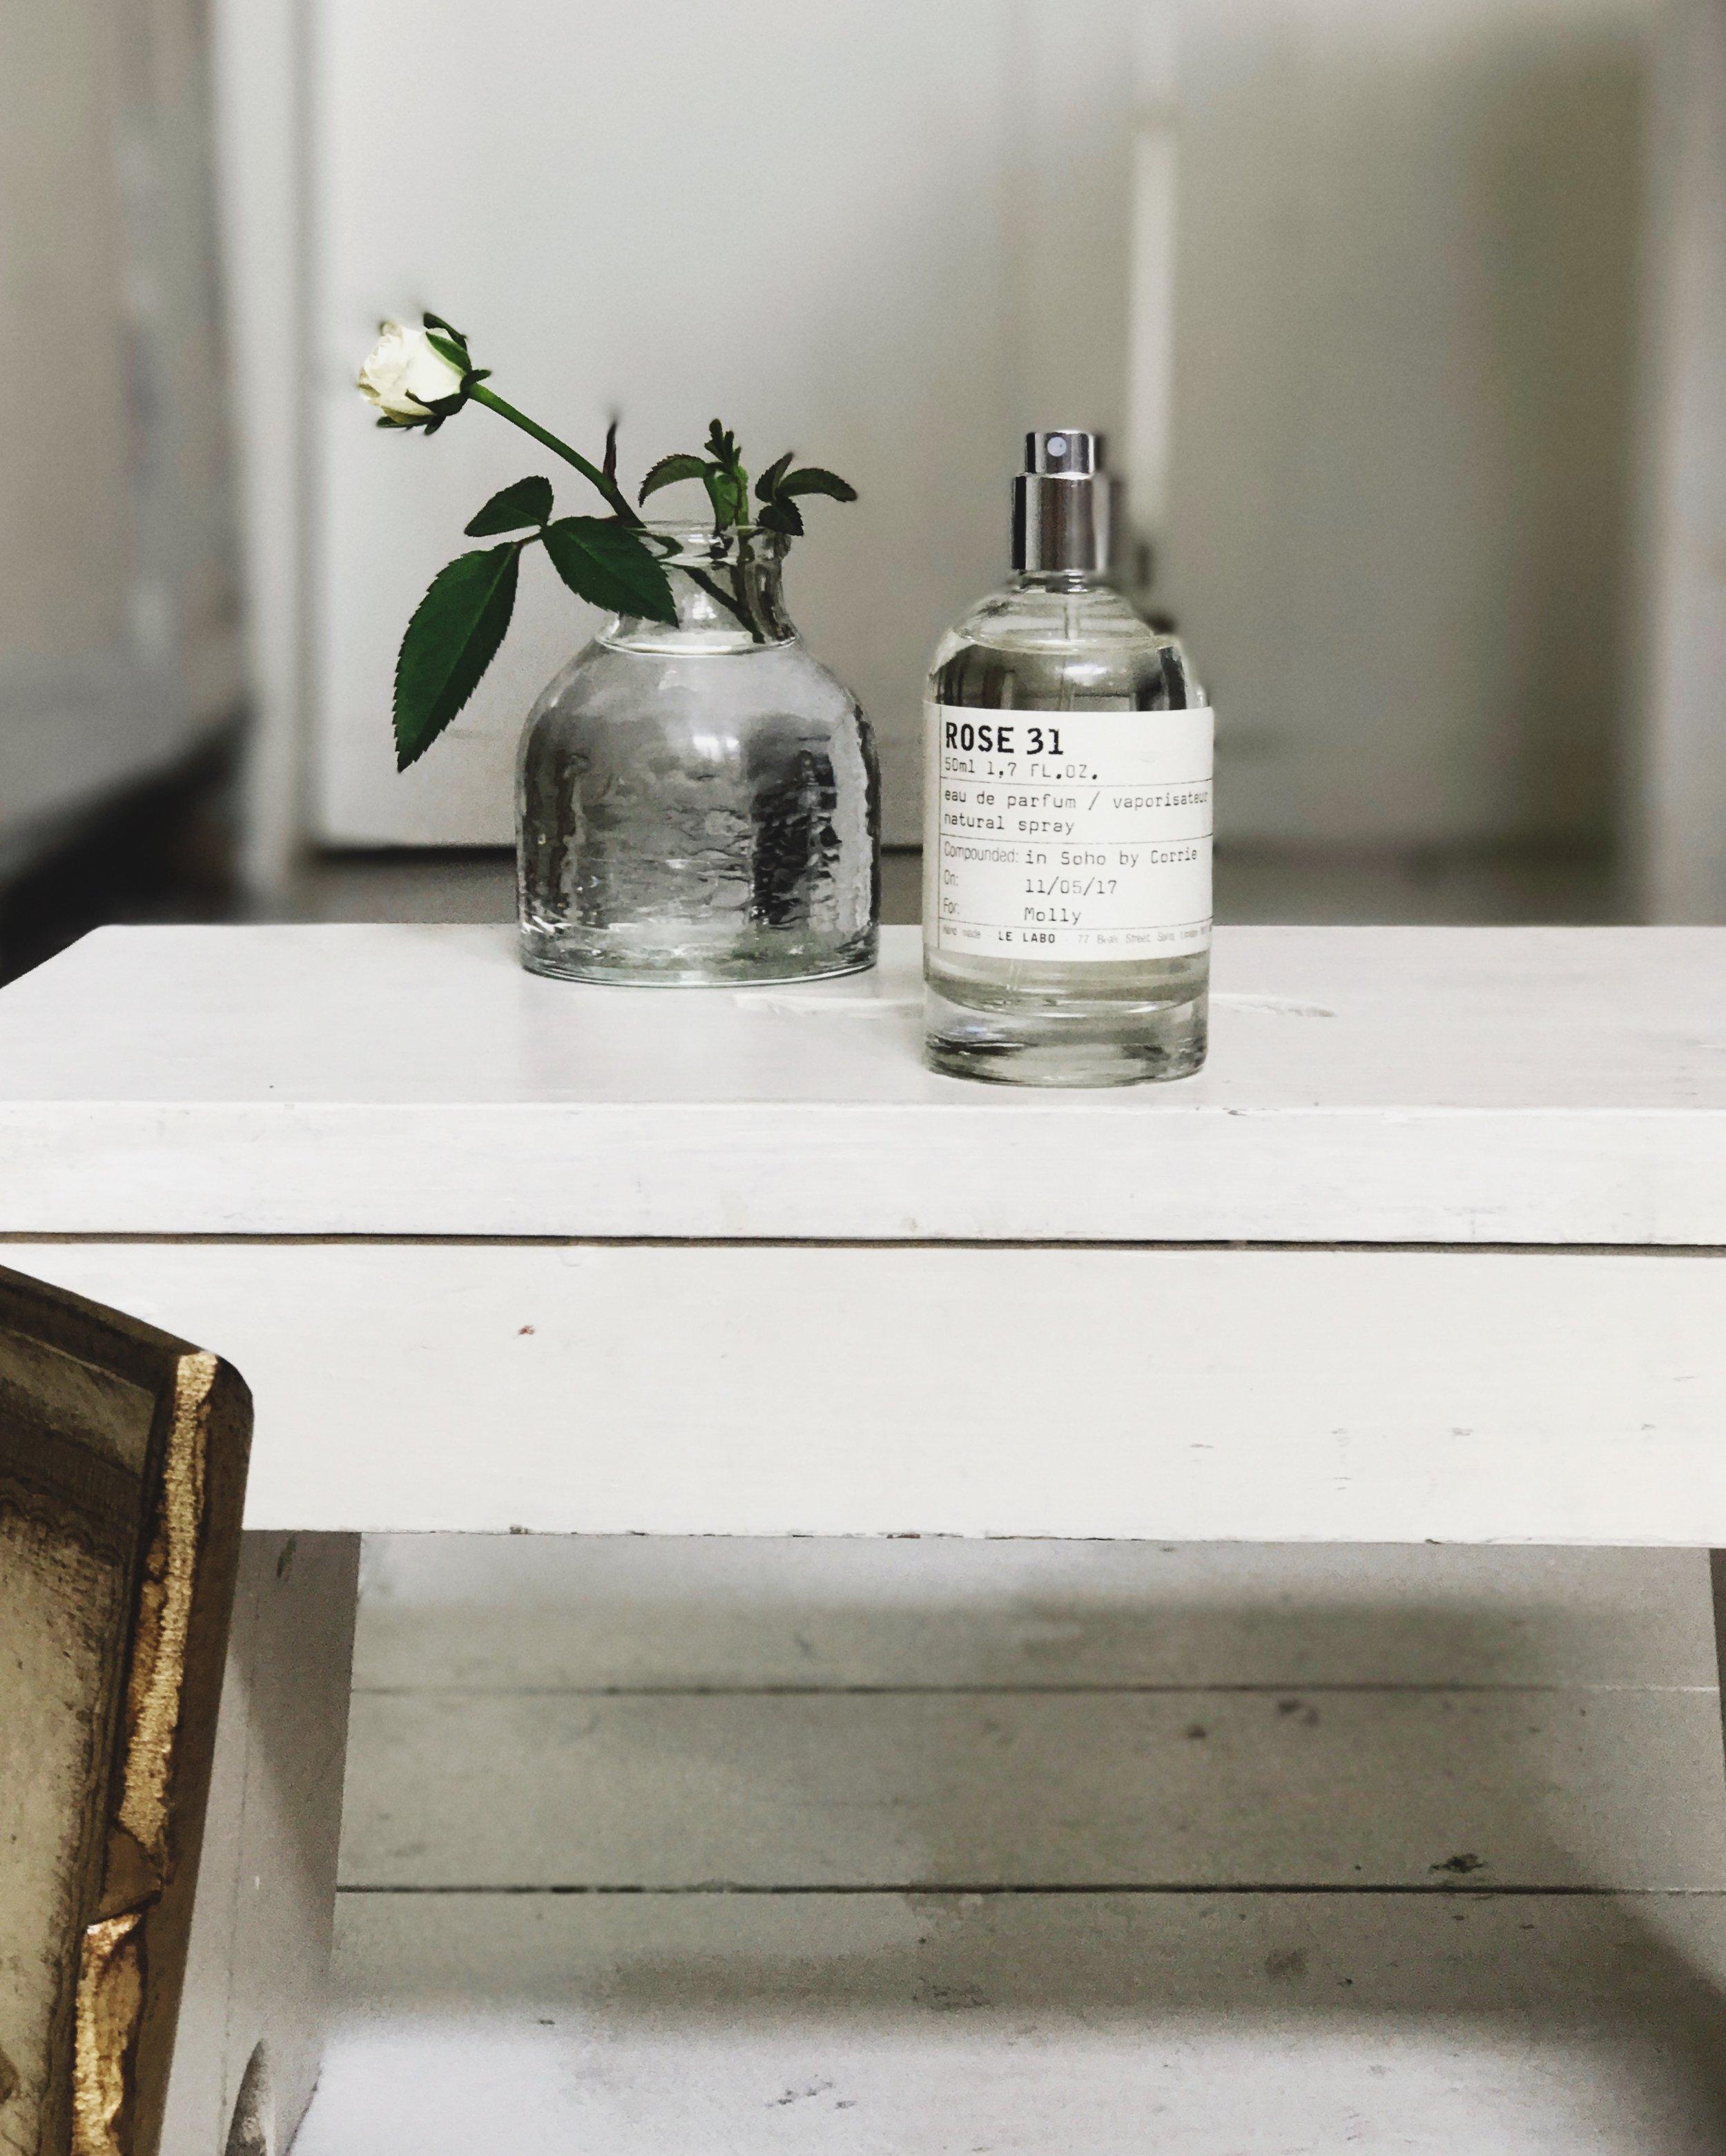 Le Labo Fragrances, Rose 31